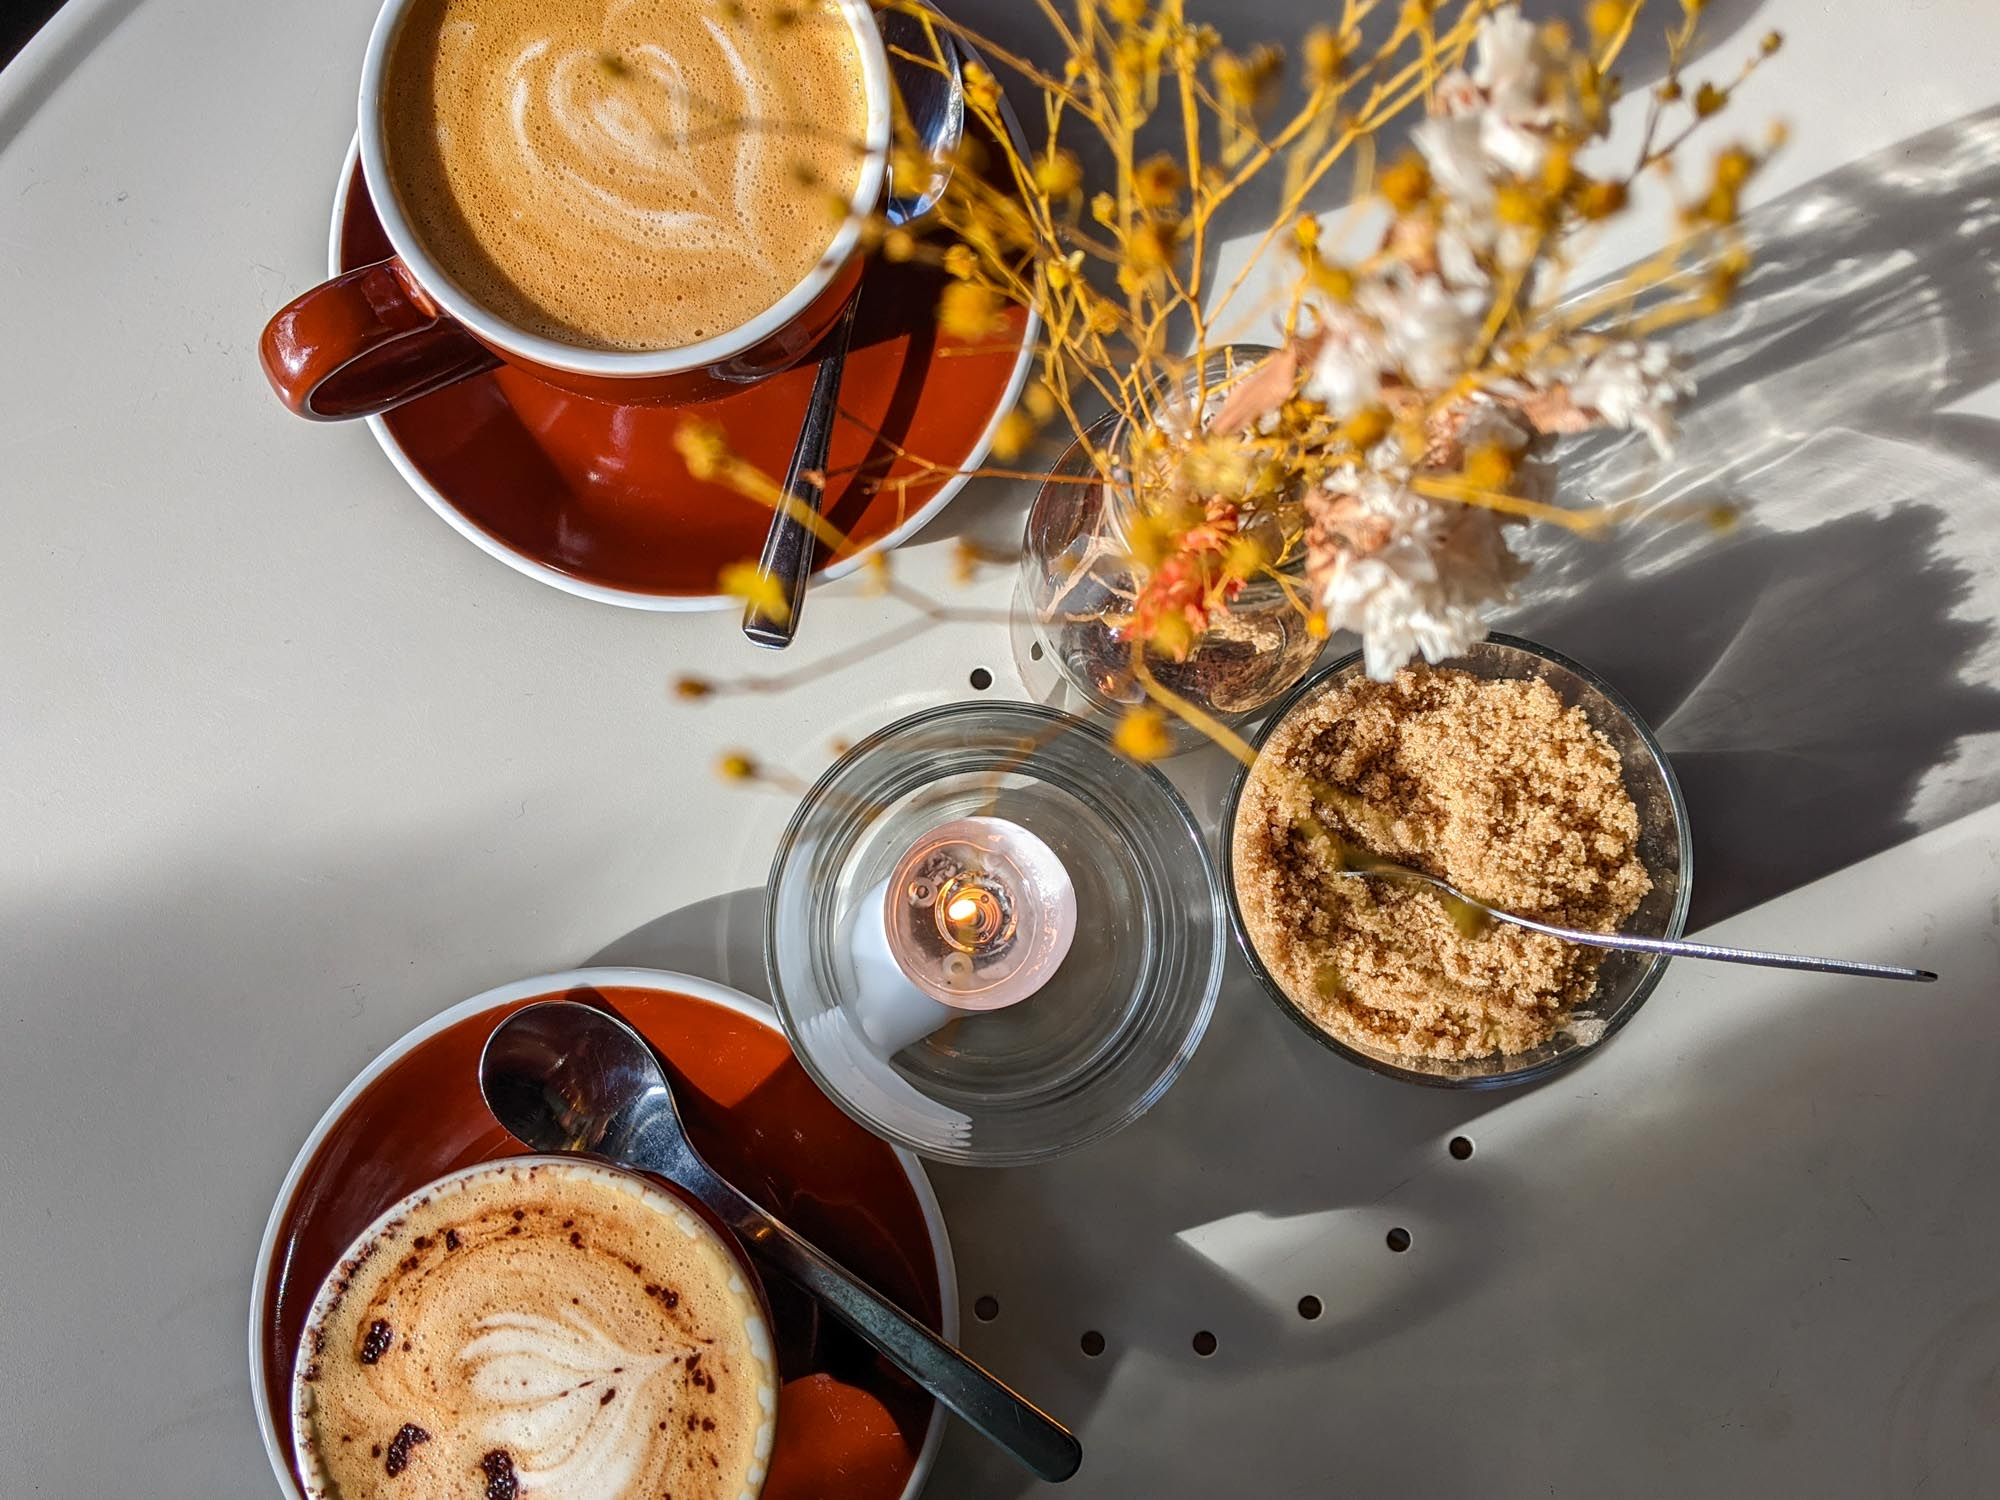 Thoughtfully Cafe